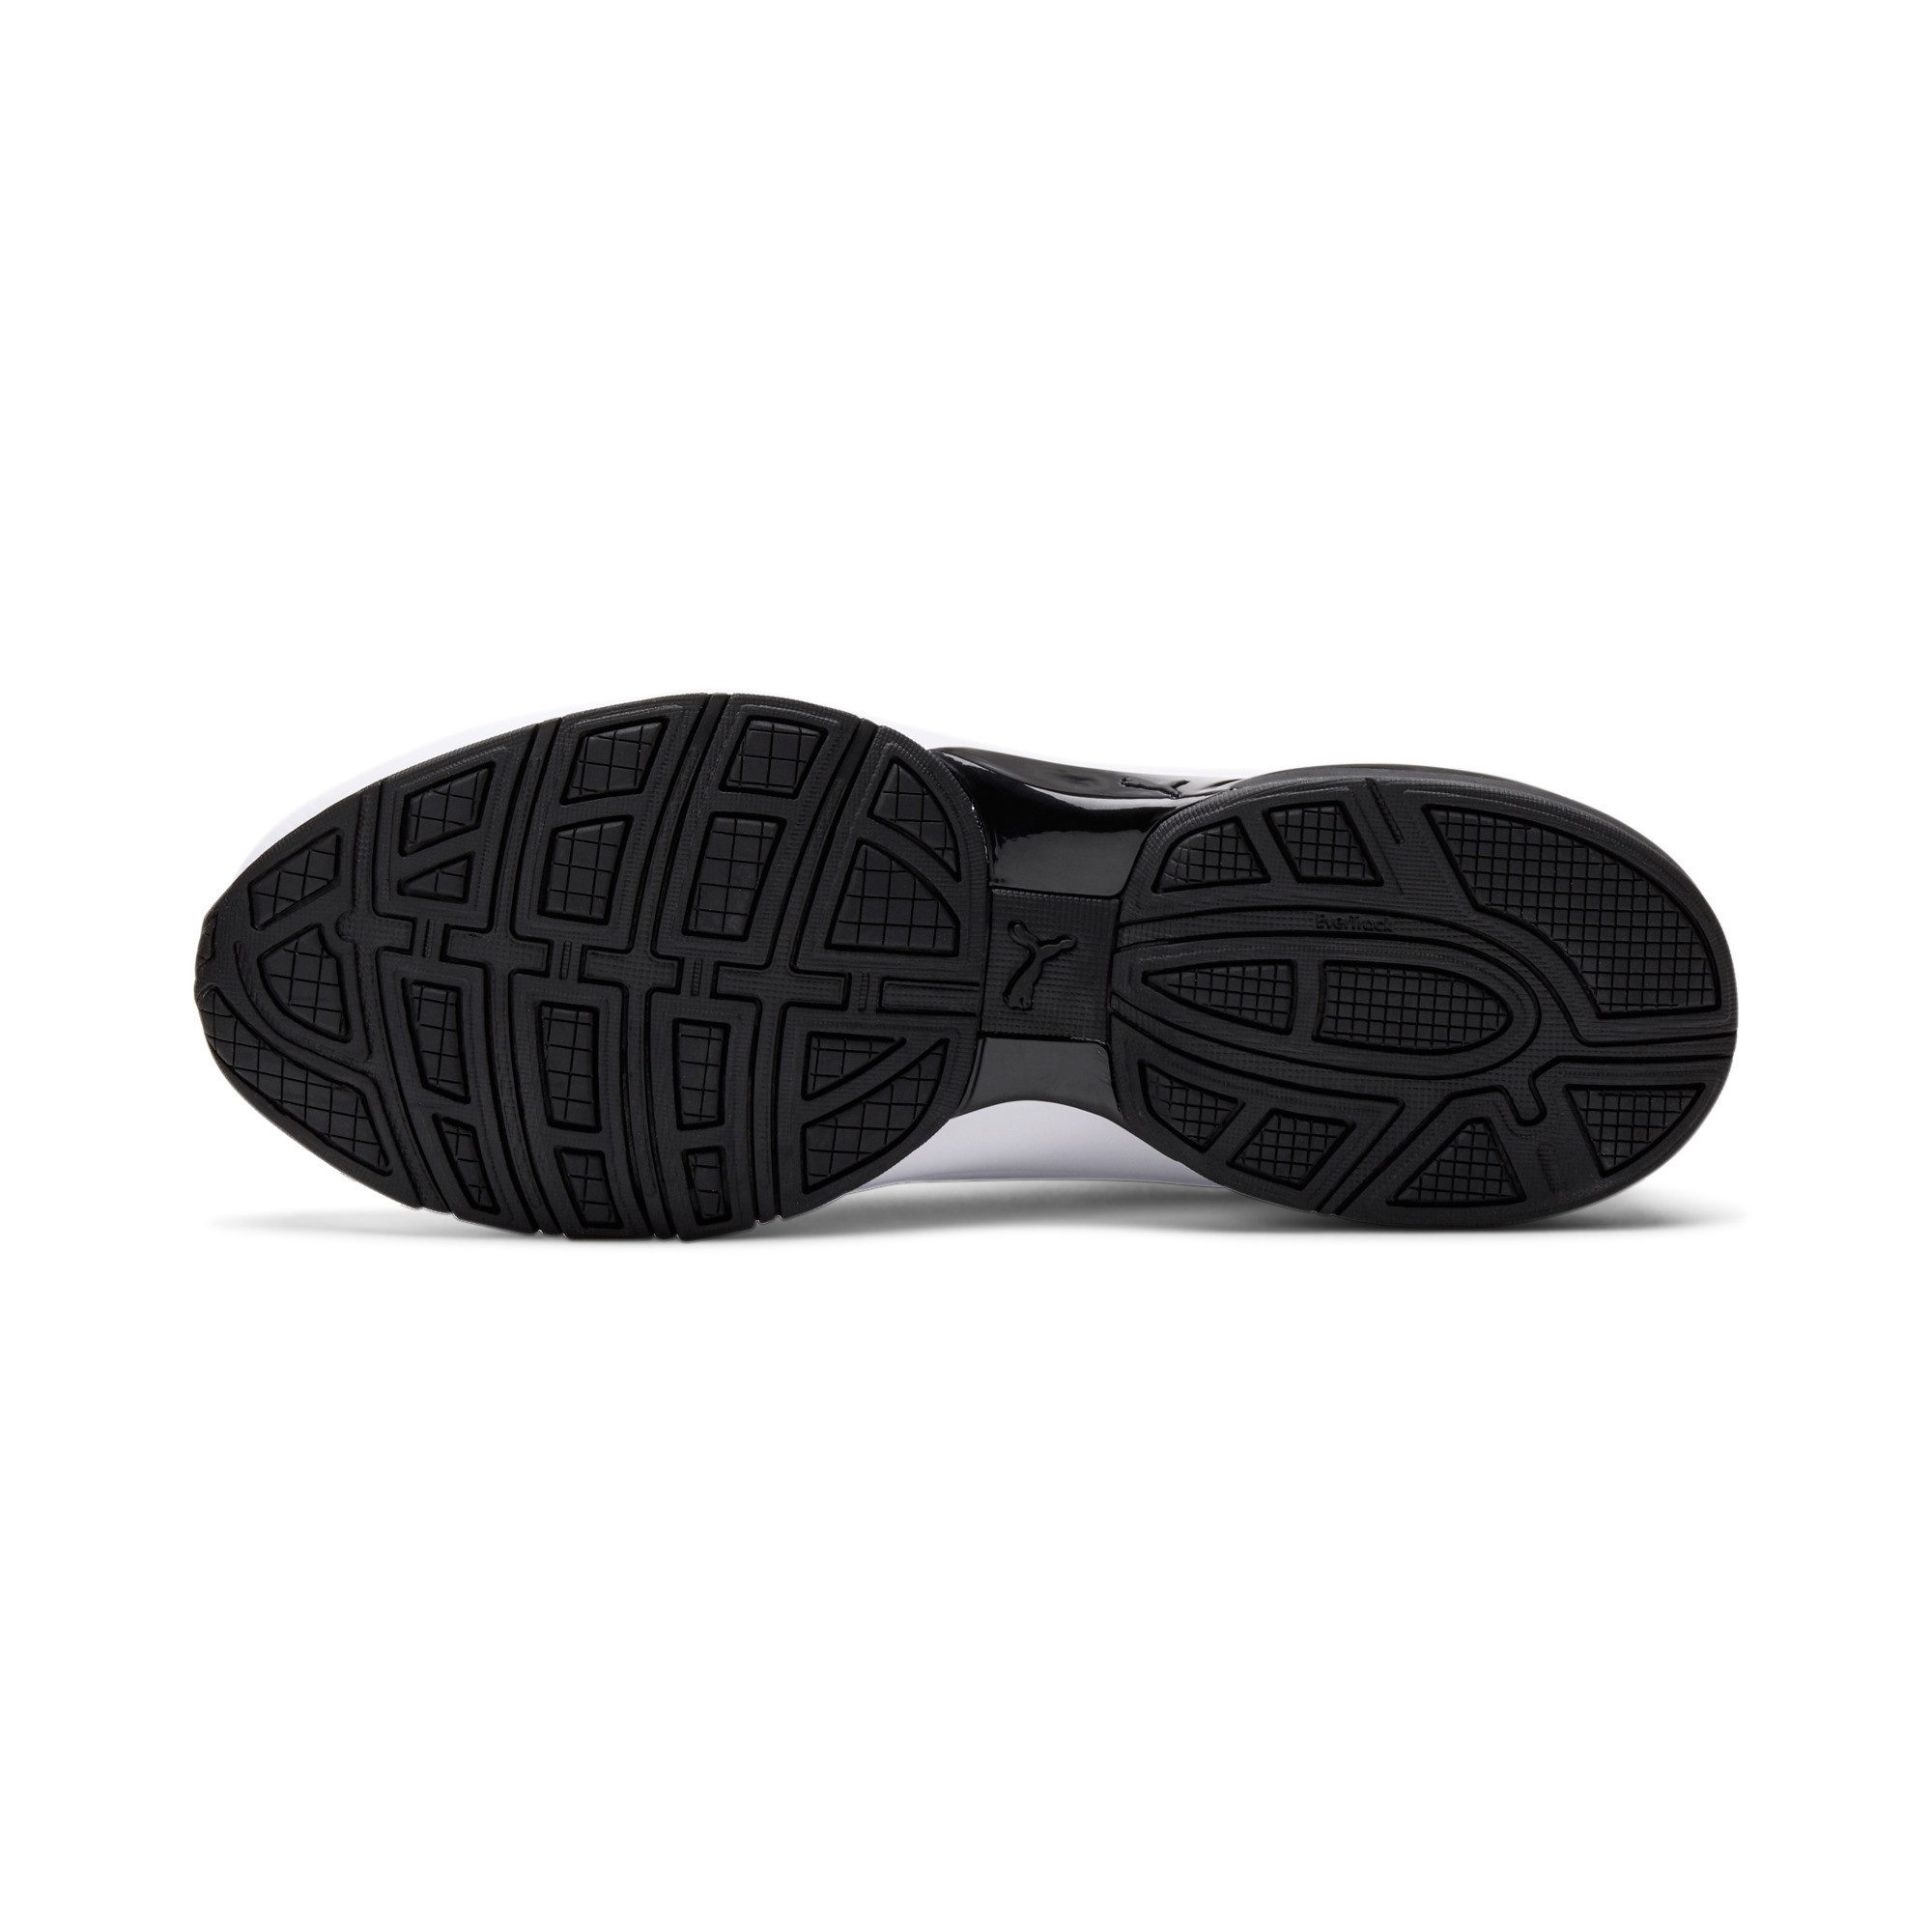 thumbnail 20 - PUMA Men's Viz Runner Graphic Sneakers